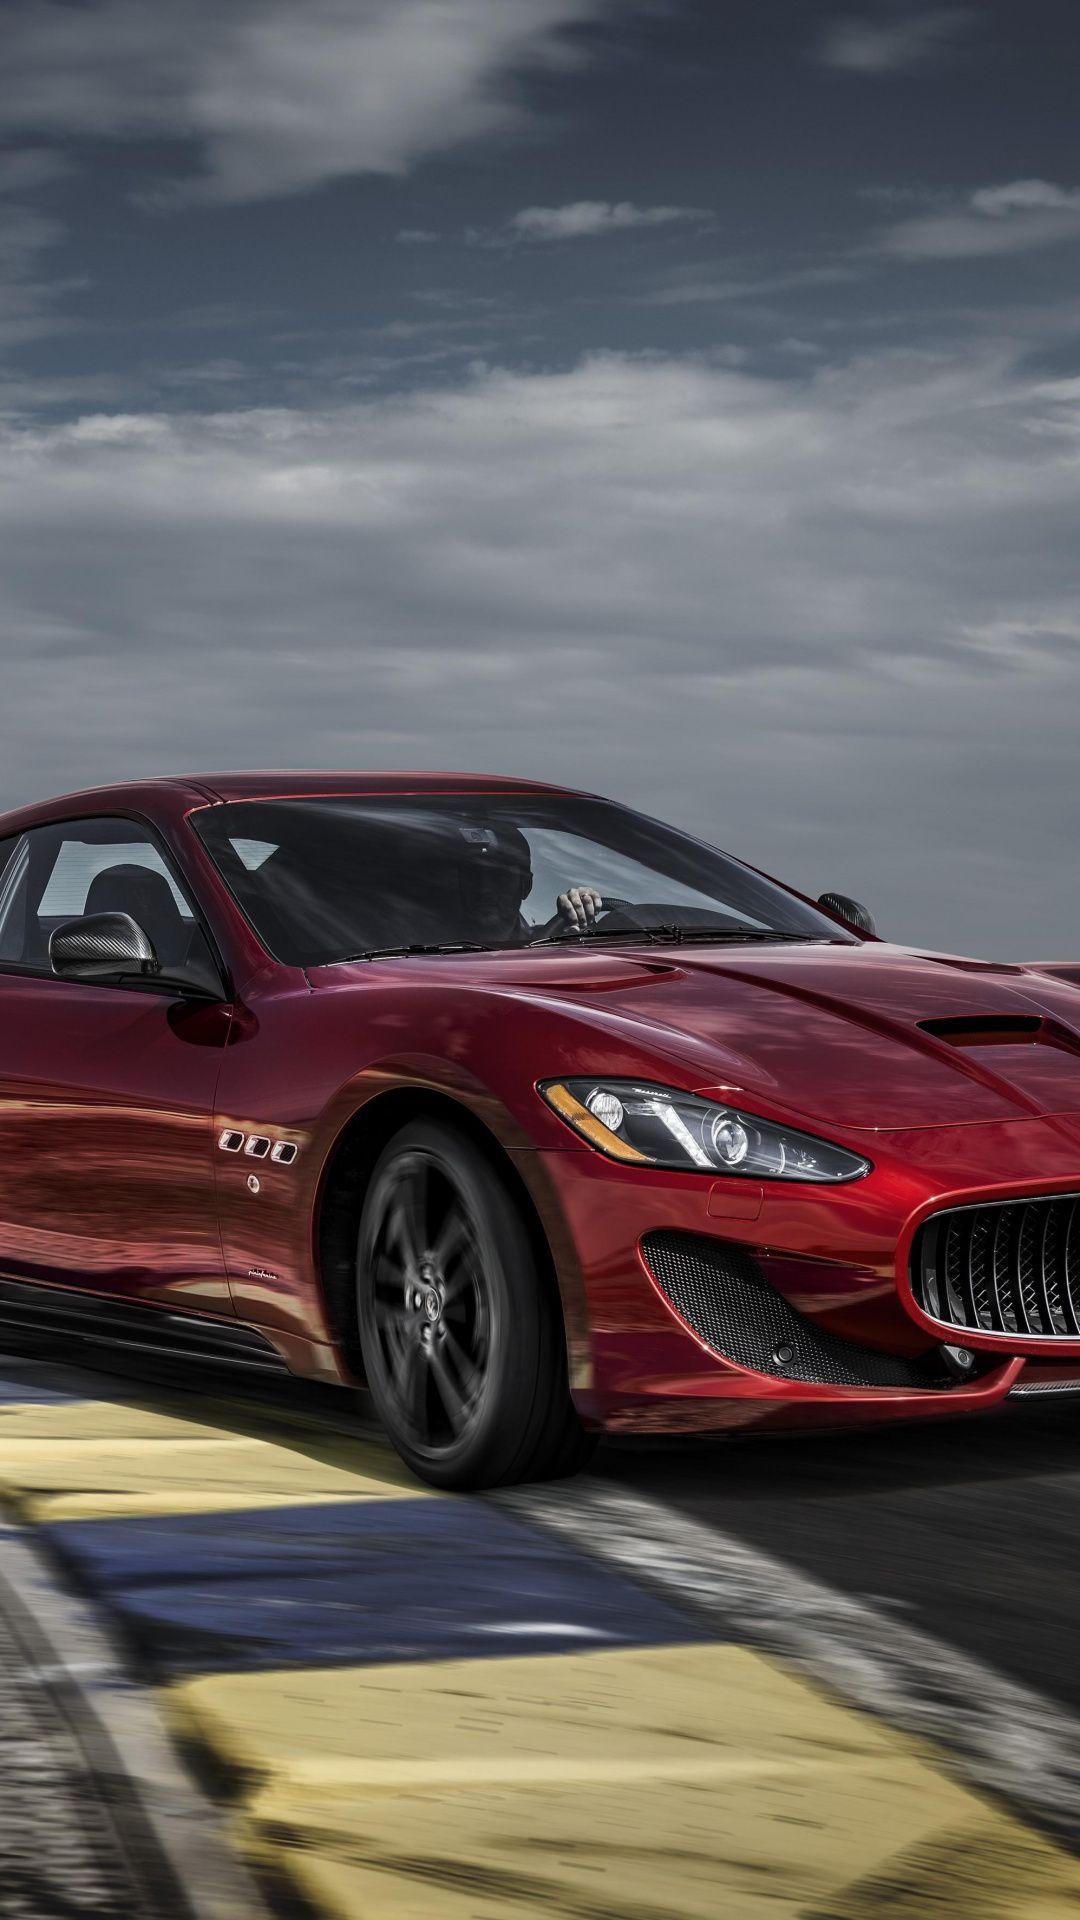 Wallpapers Maserati Coup Sports Car Supercar Gran Turismo Sport Maserati Super Cars Maserati Granturismo Sport